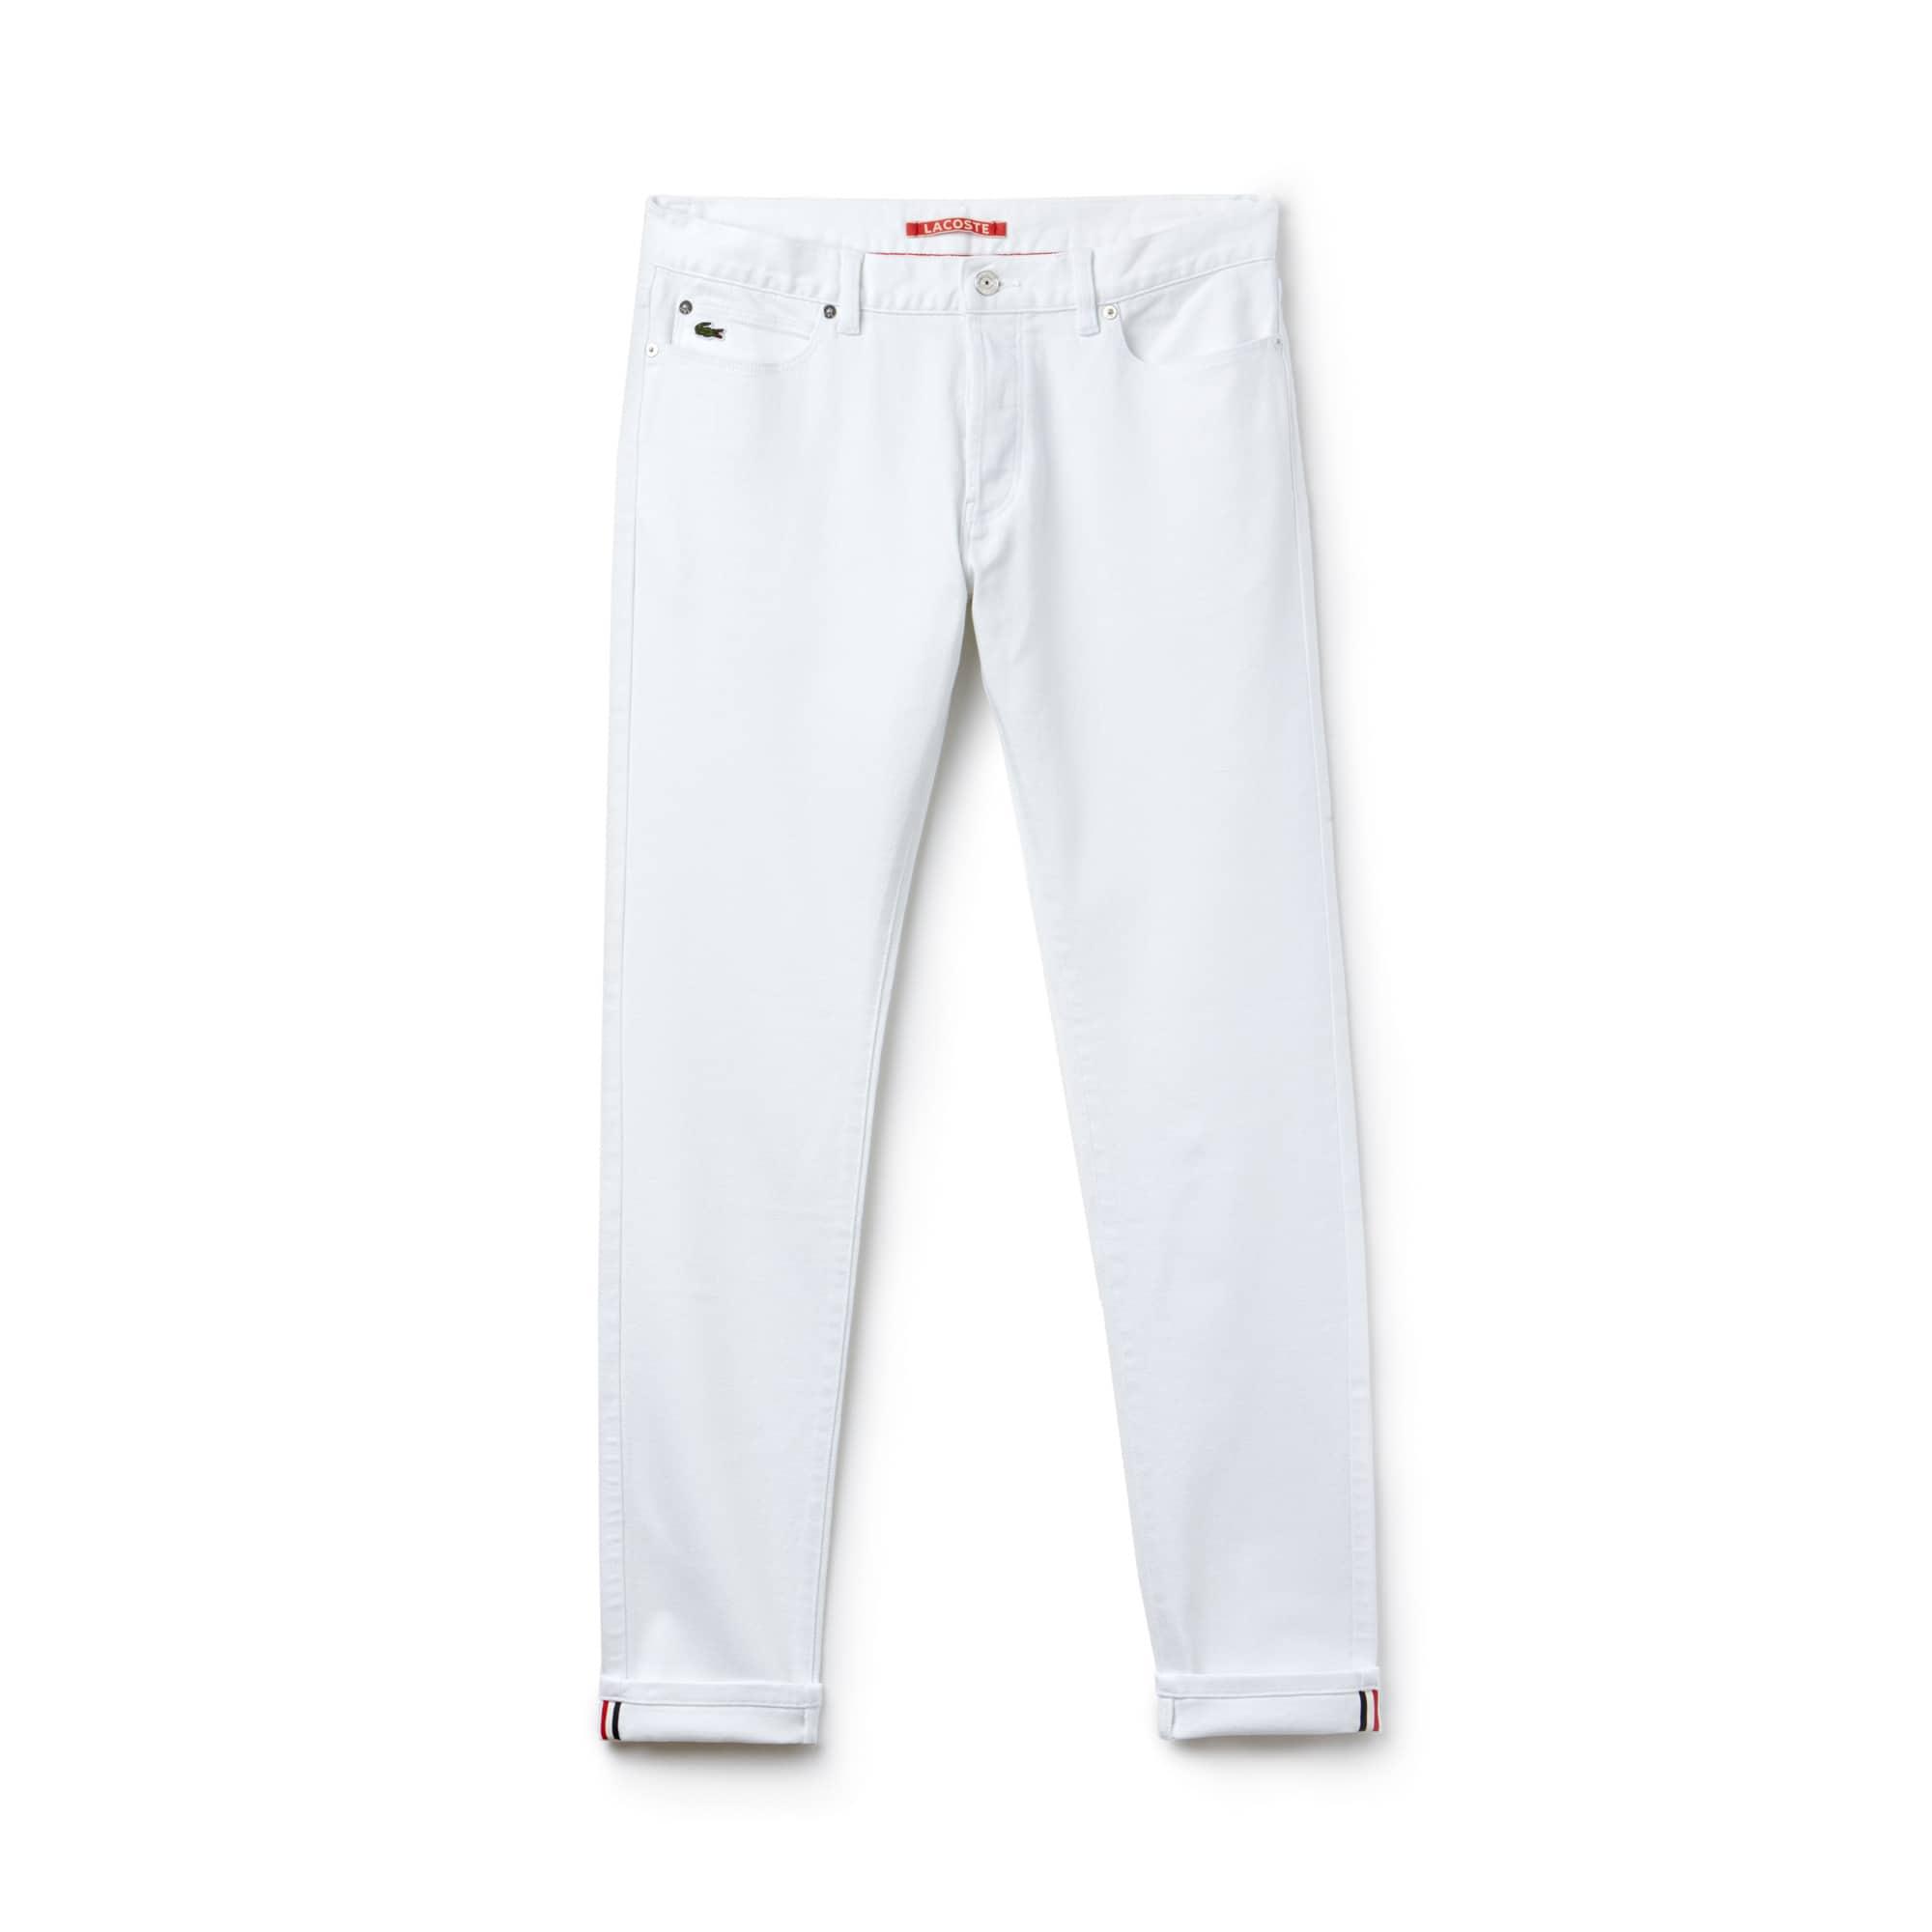 Men's Lacoste LIVE 5-Pocket Turned Edge Stretch Denim Jeans